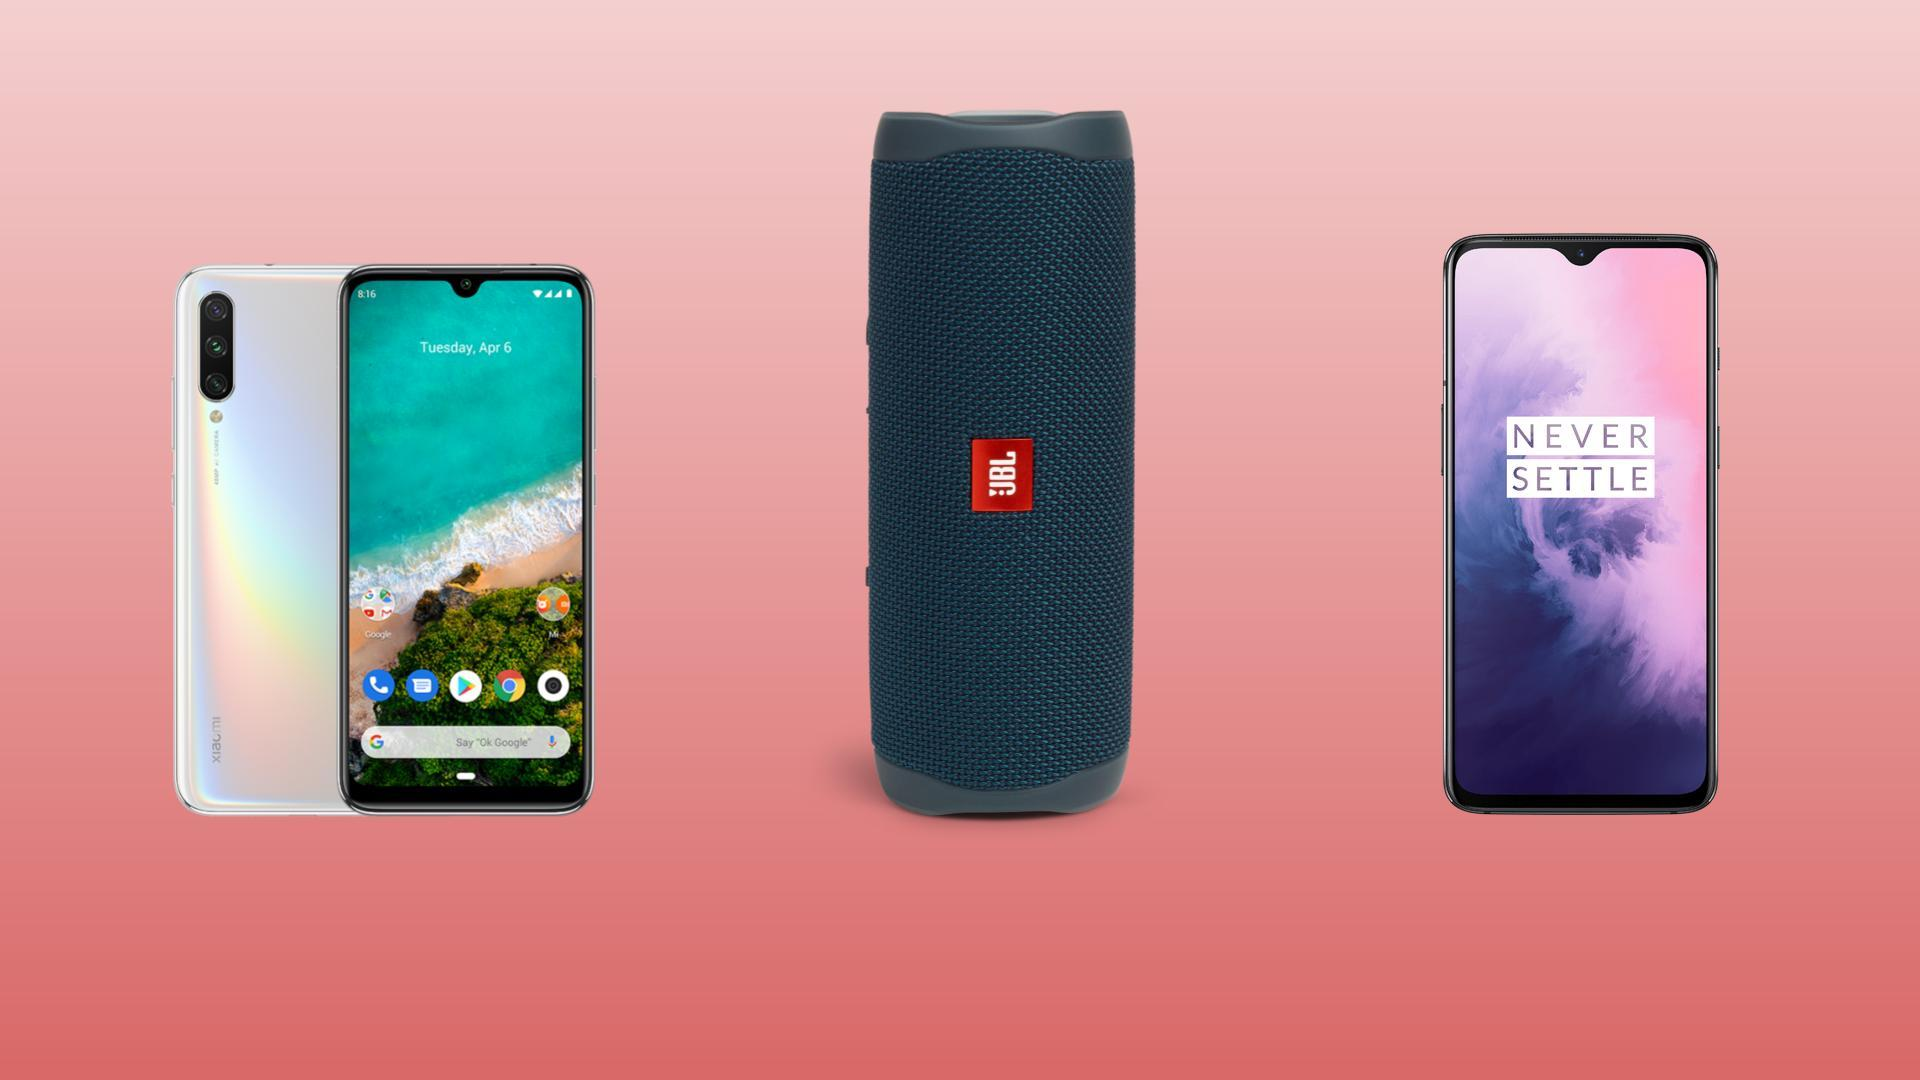 OnePlus 7 à 389 euros, Xiaomi Mi A3 à 167 euros et enceinte JBL Flip 5 à 95 euros